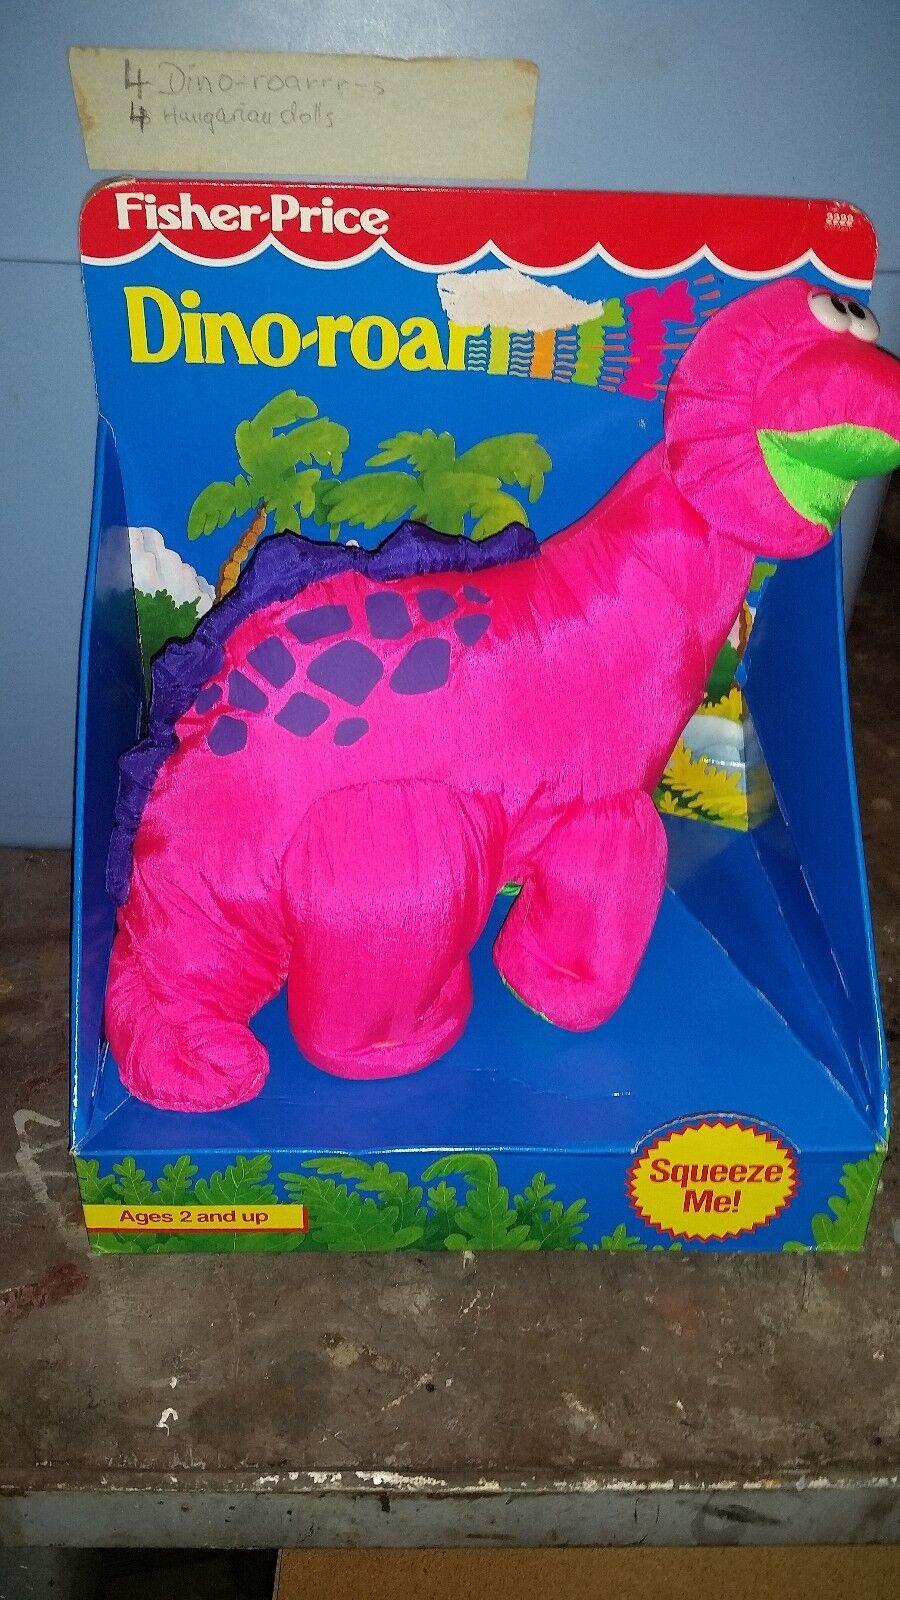 Dino roarrrrrrs fisher - price